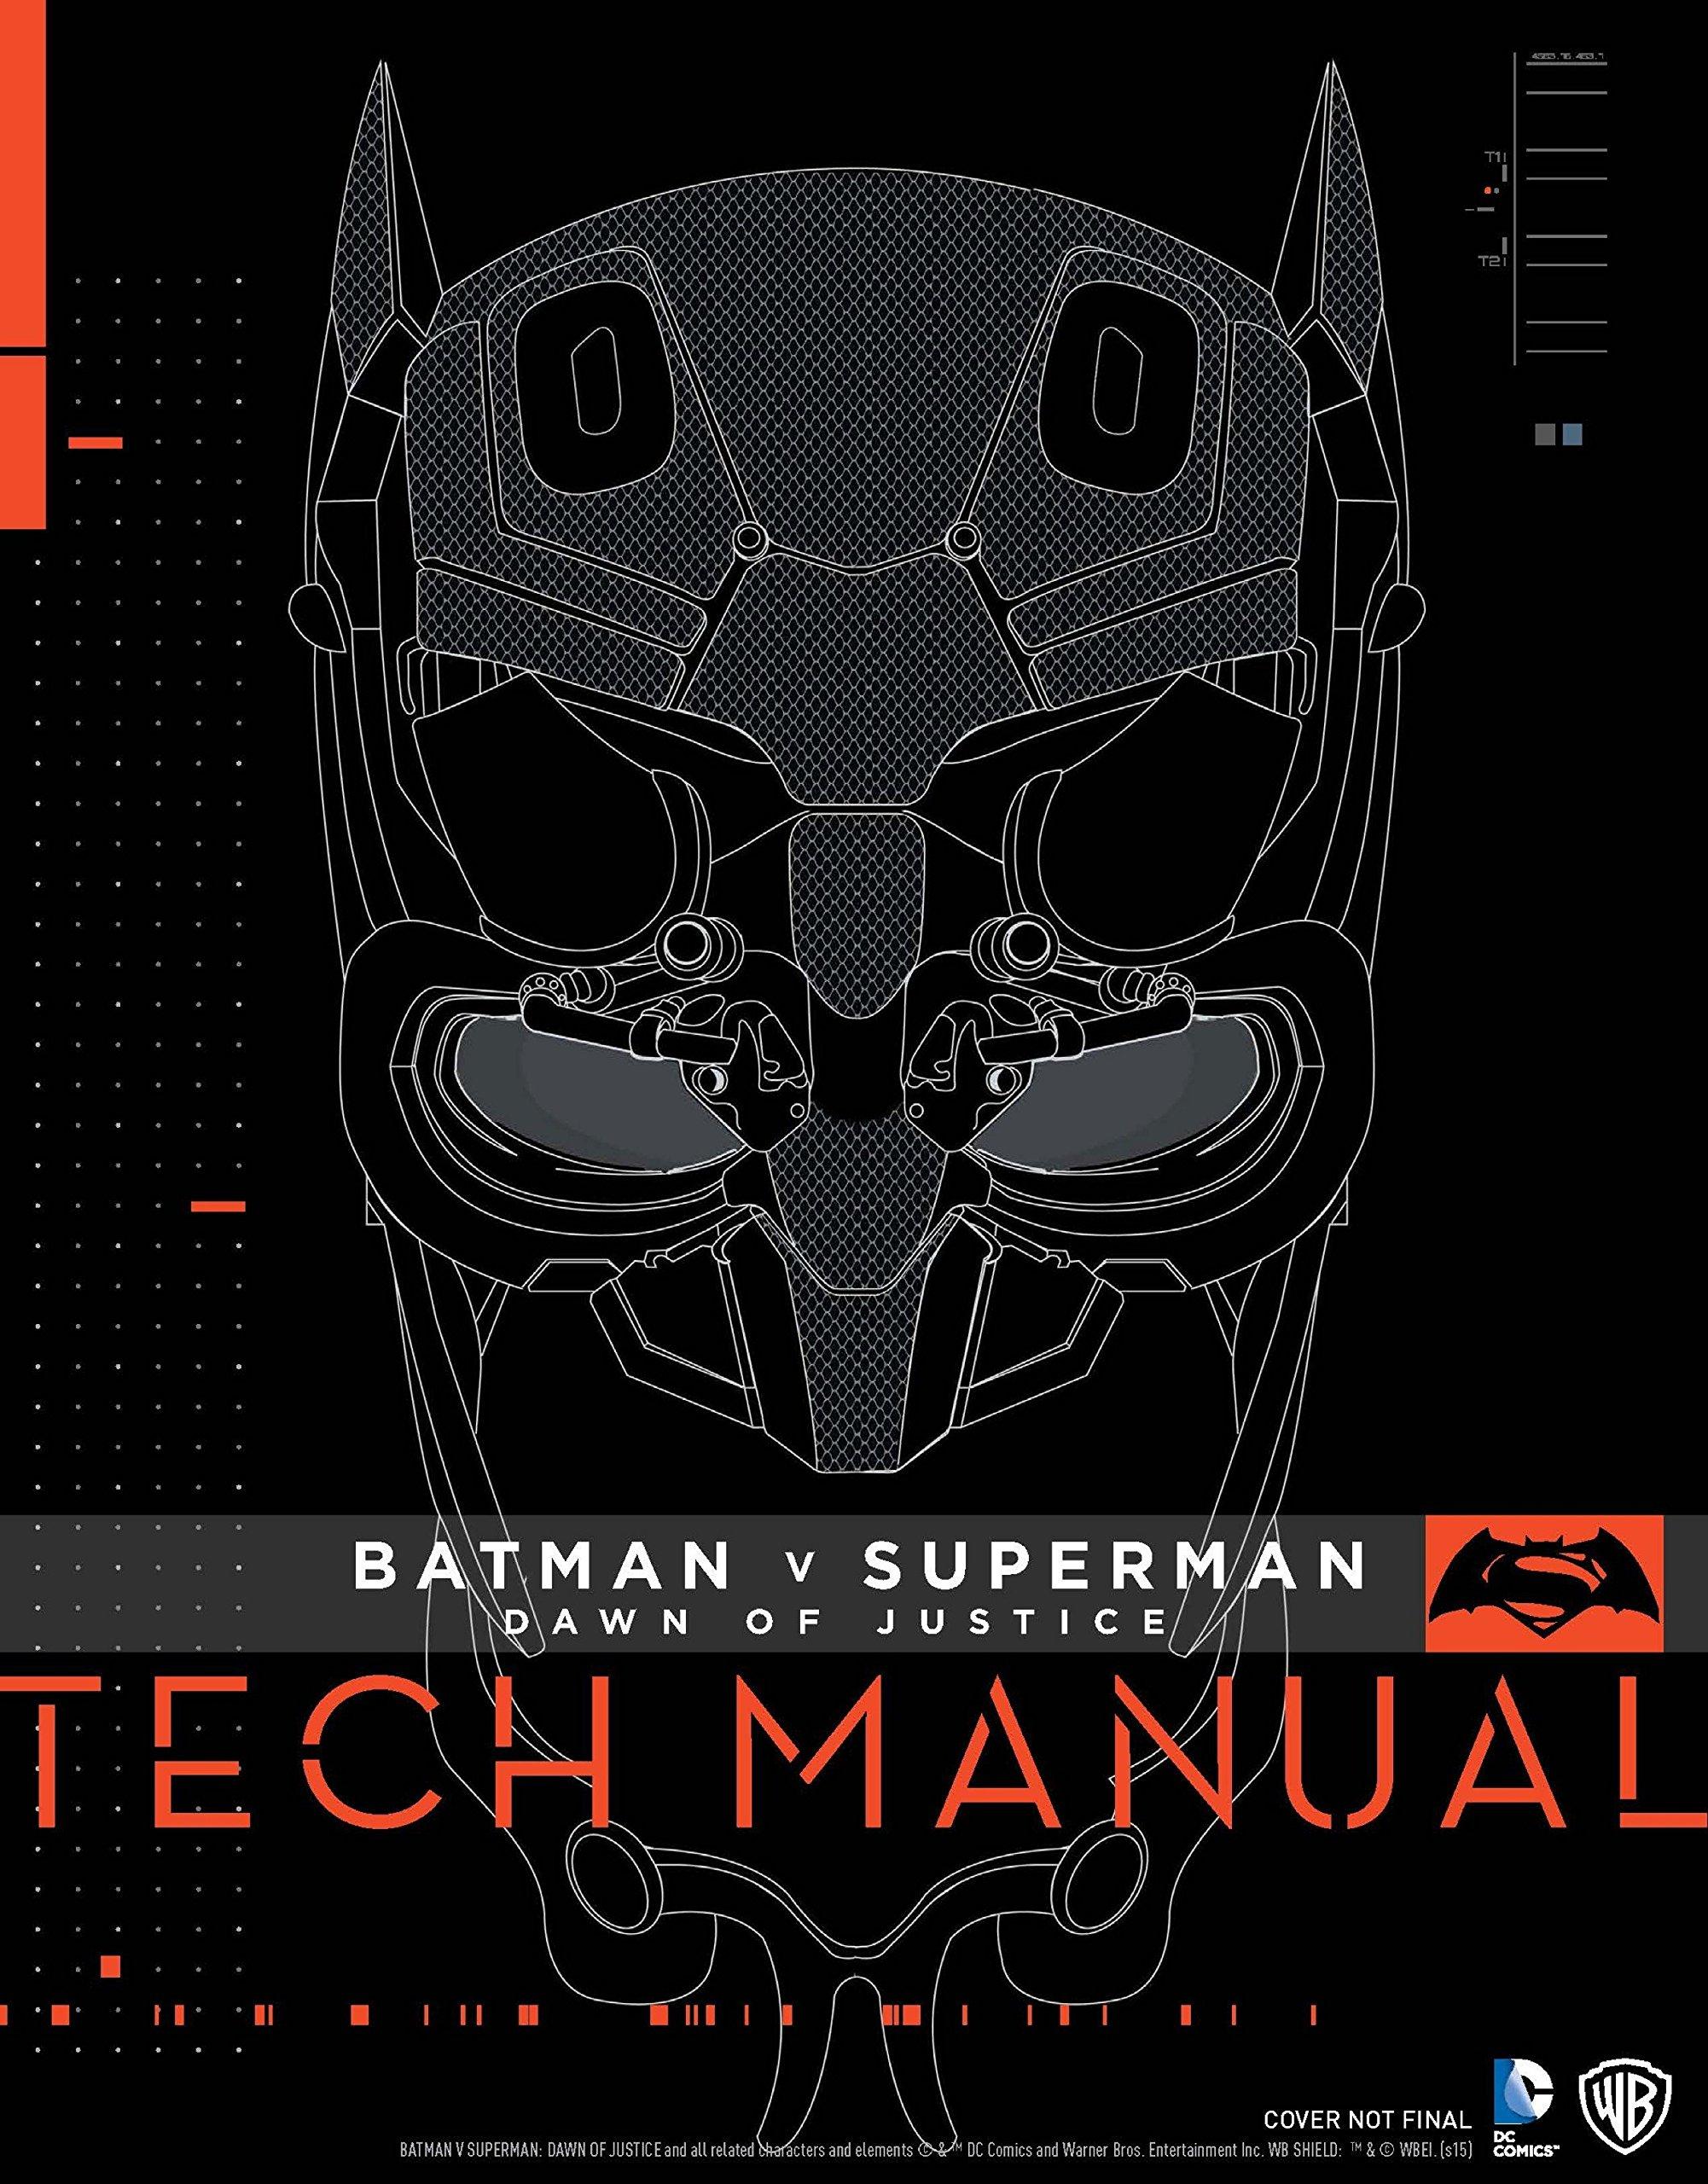 king tech manual